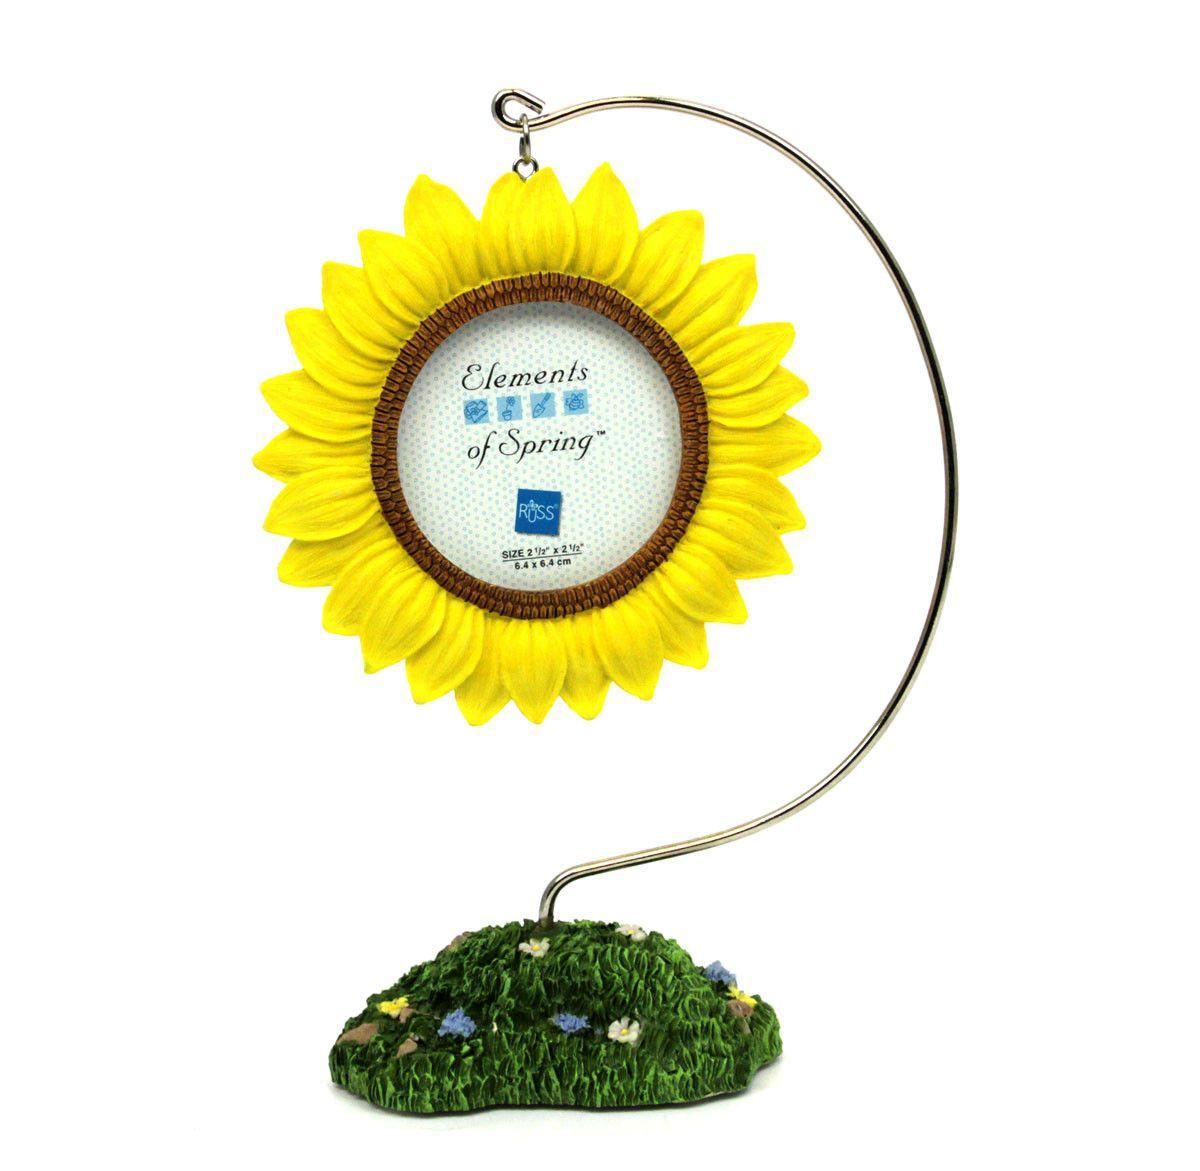 Elements of Spring - Sunflower Photo Frame | Sunflowers, Sunflower ...